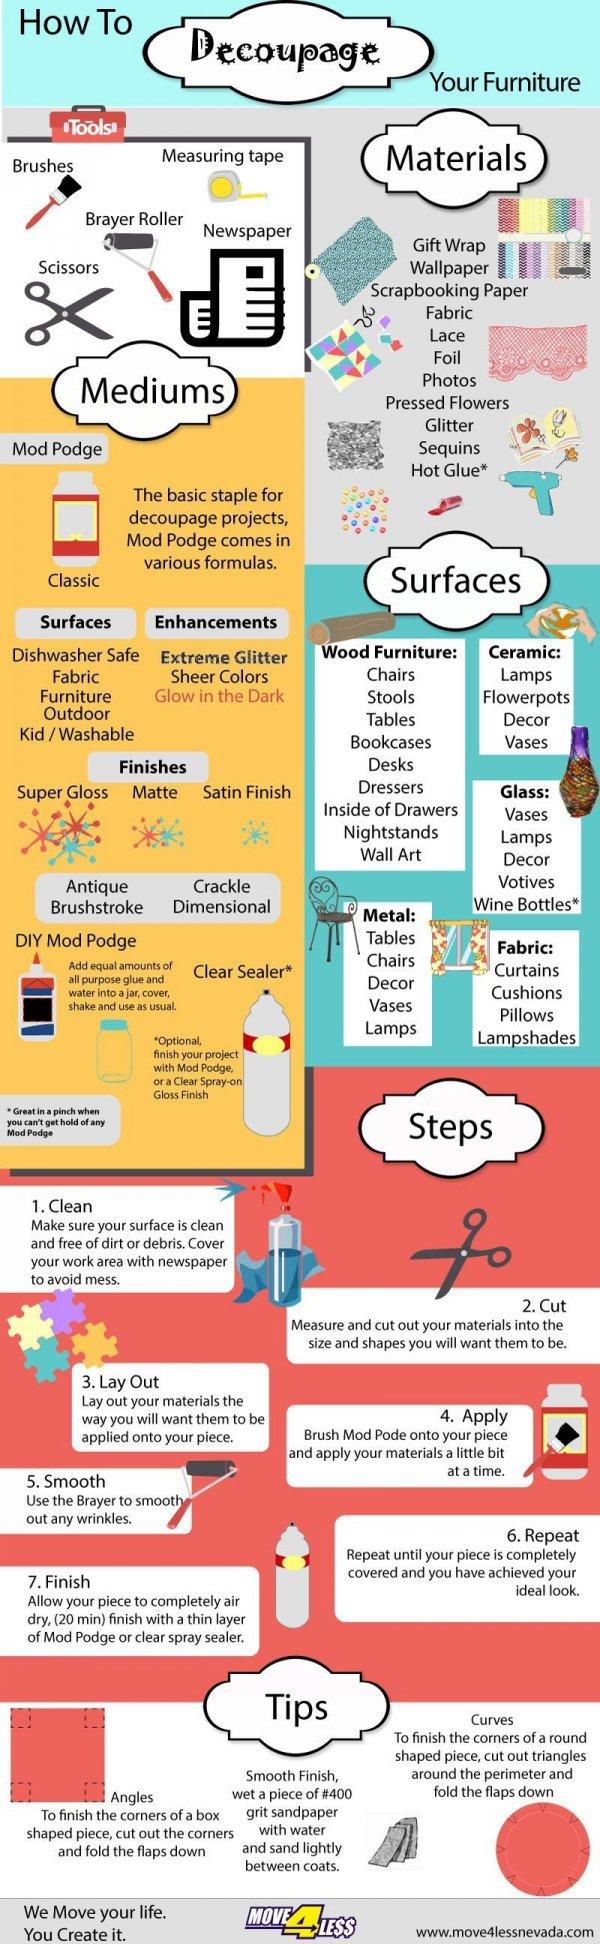 Best Ideas for Restoring Furniture